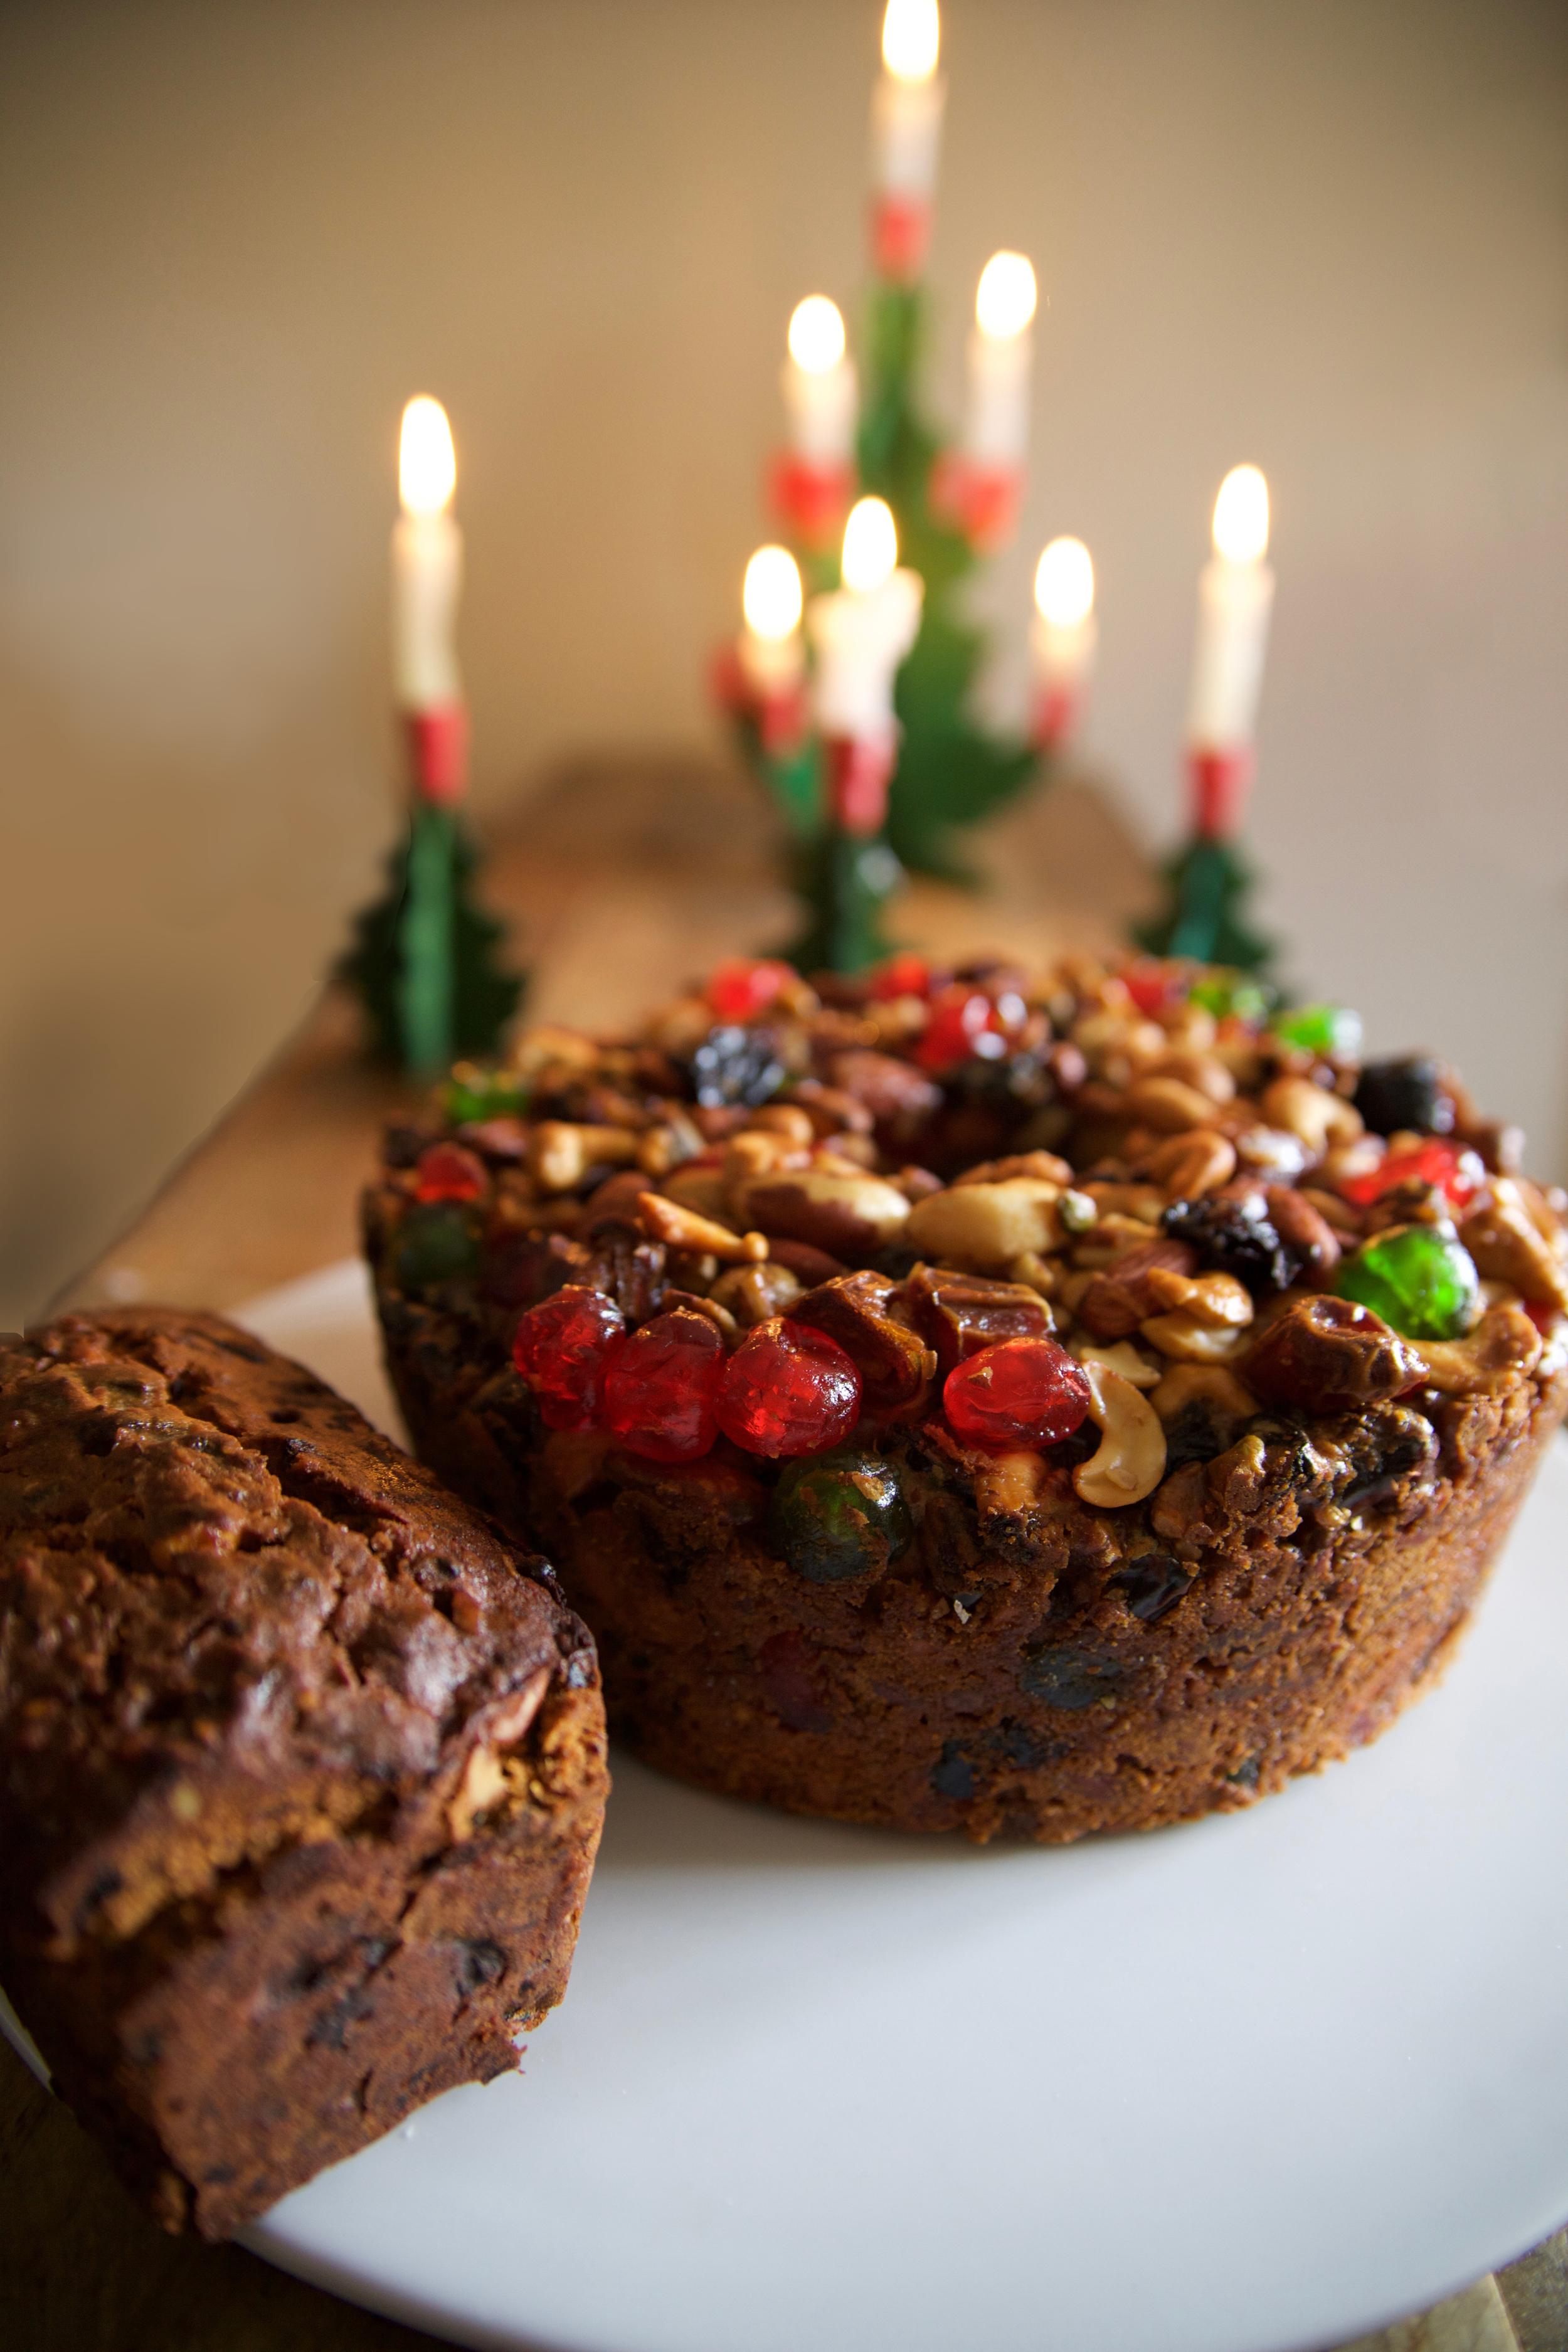 Left: Nigel Slater's Christmas Cake. Right: Good Housekeeping (?) Fruitcake